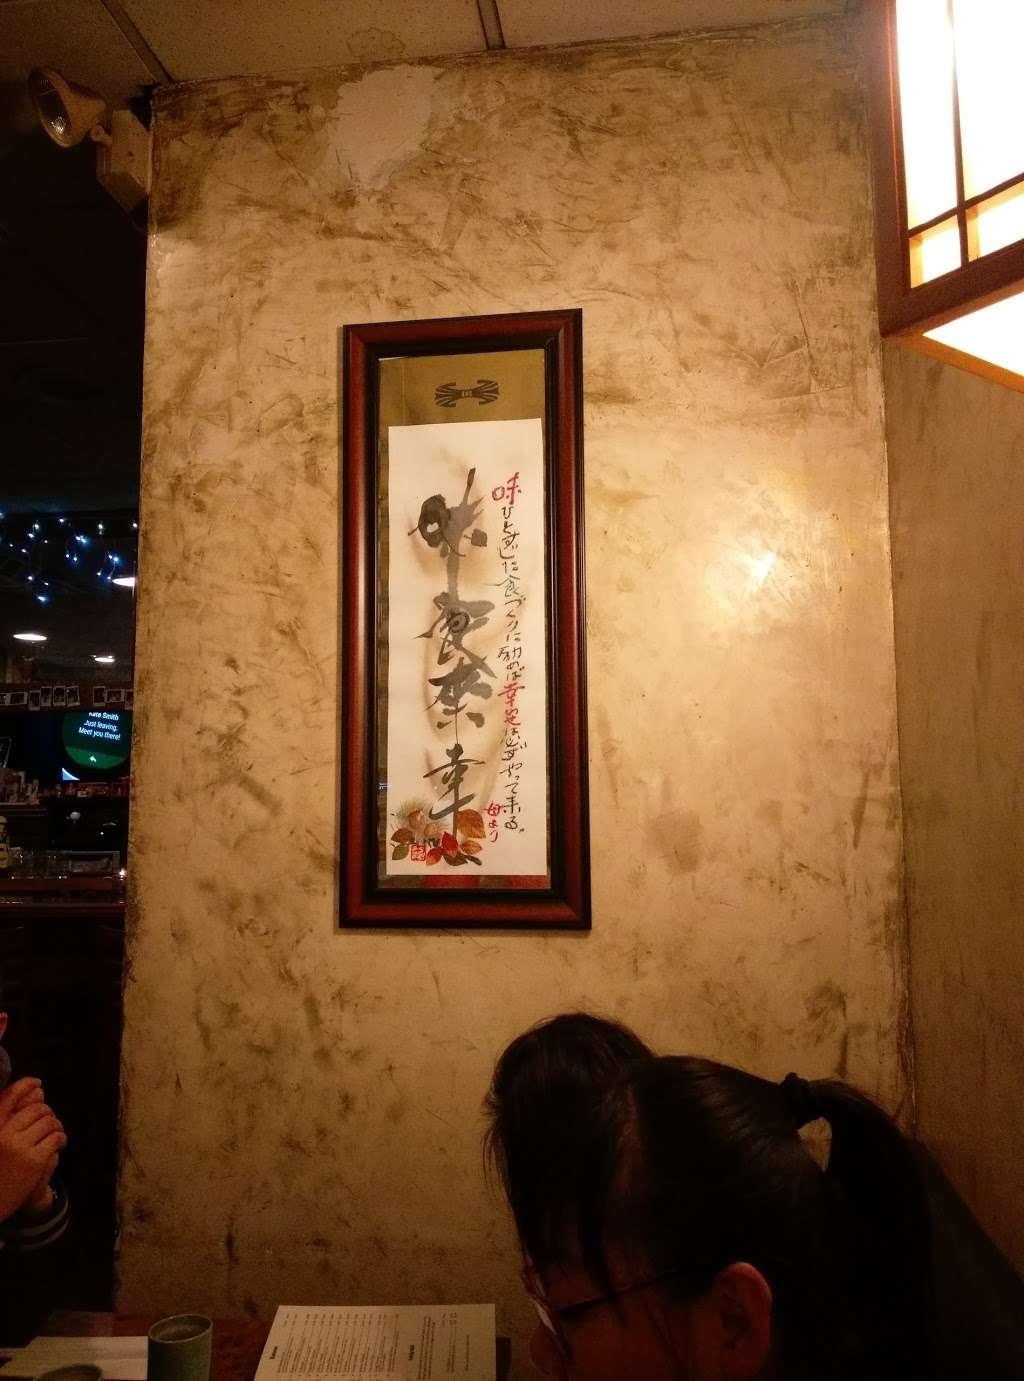 Kaname Japanese Restaurant - restaurant  | Photo 7 of 10 | Address: 3203, 783 Palisade Ave, Cliffside Park, NJ 07010, USA | Phone: (201) 886-0080